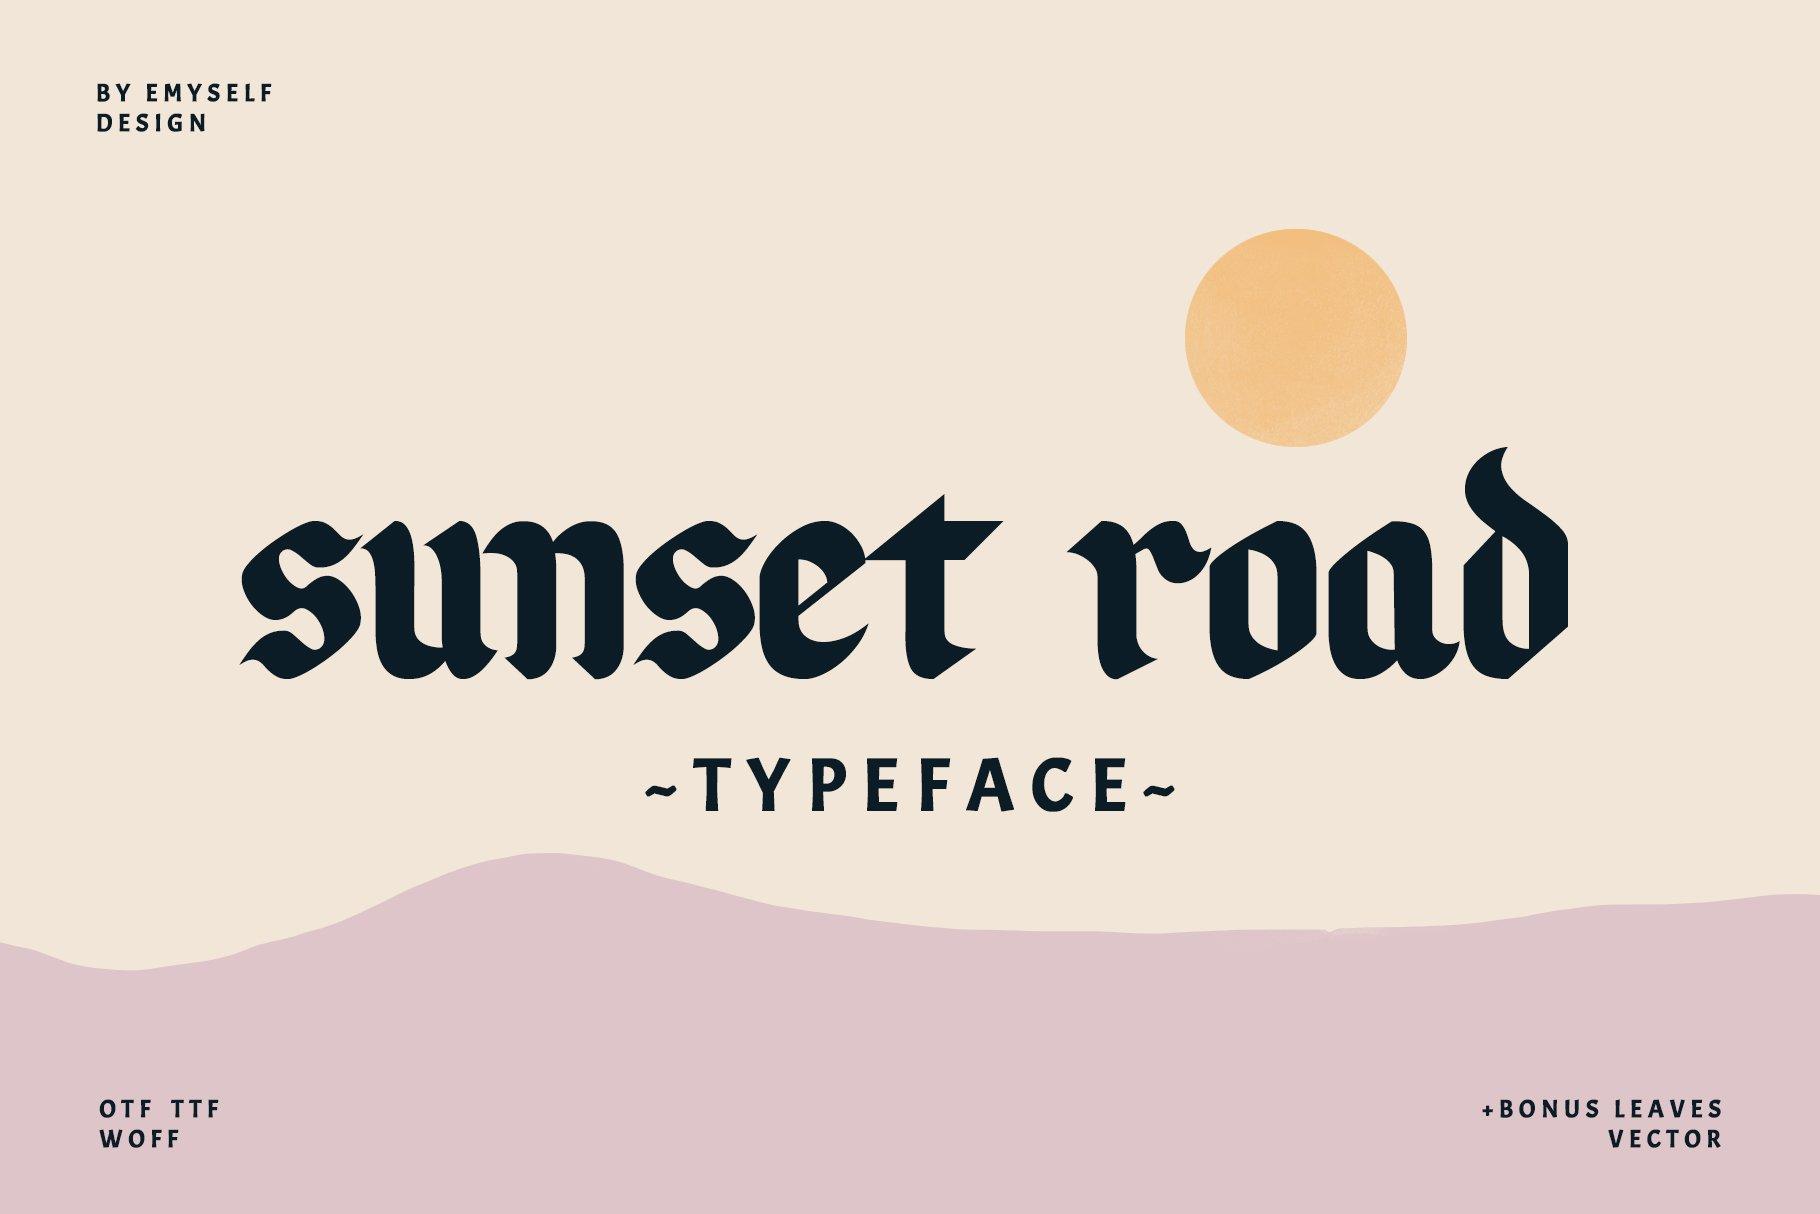 Sunset Road 个性哥特纹身英文字体下载